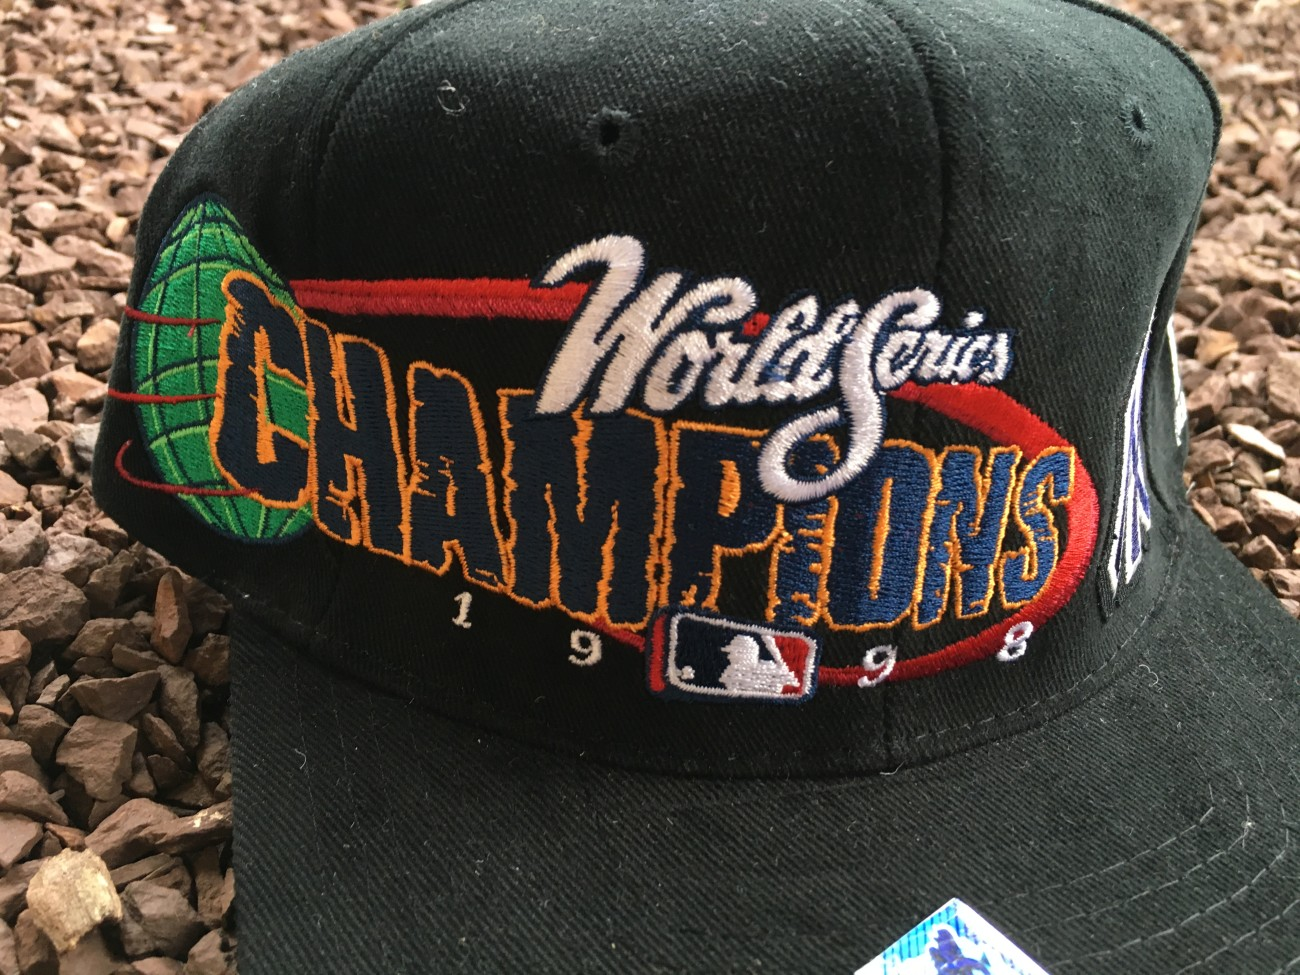 8a96ad240 1998 New York Yankees World Series Champions New Era MLB Snapback ...